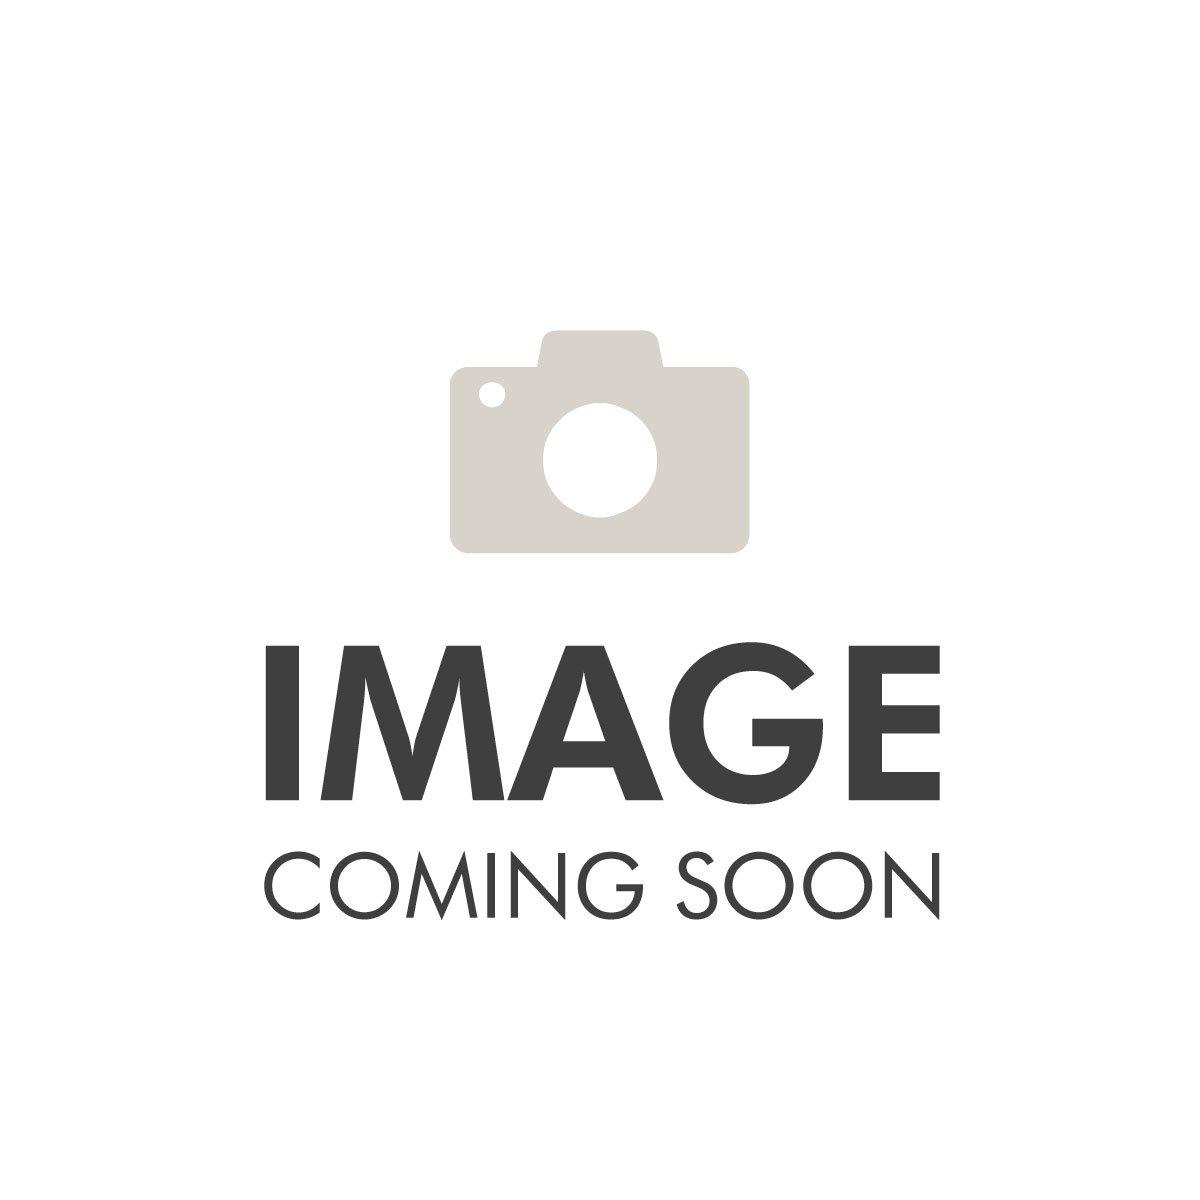 Clarins Skin Illusion Loose Powder Foundation 114 Cappuccino